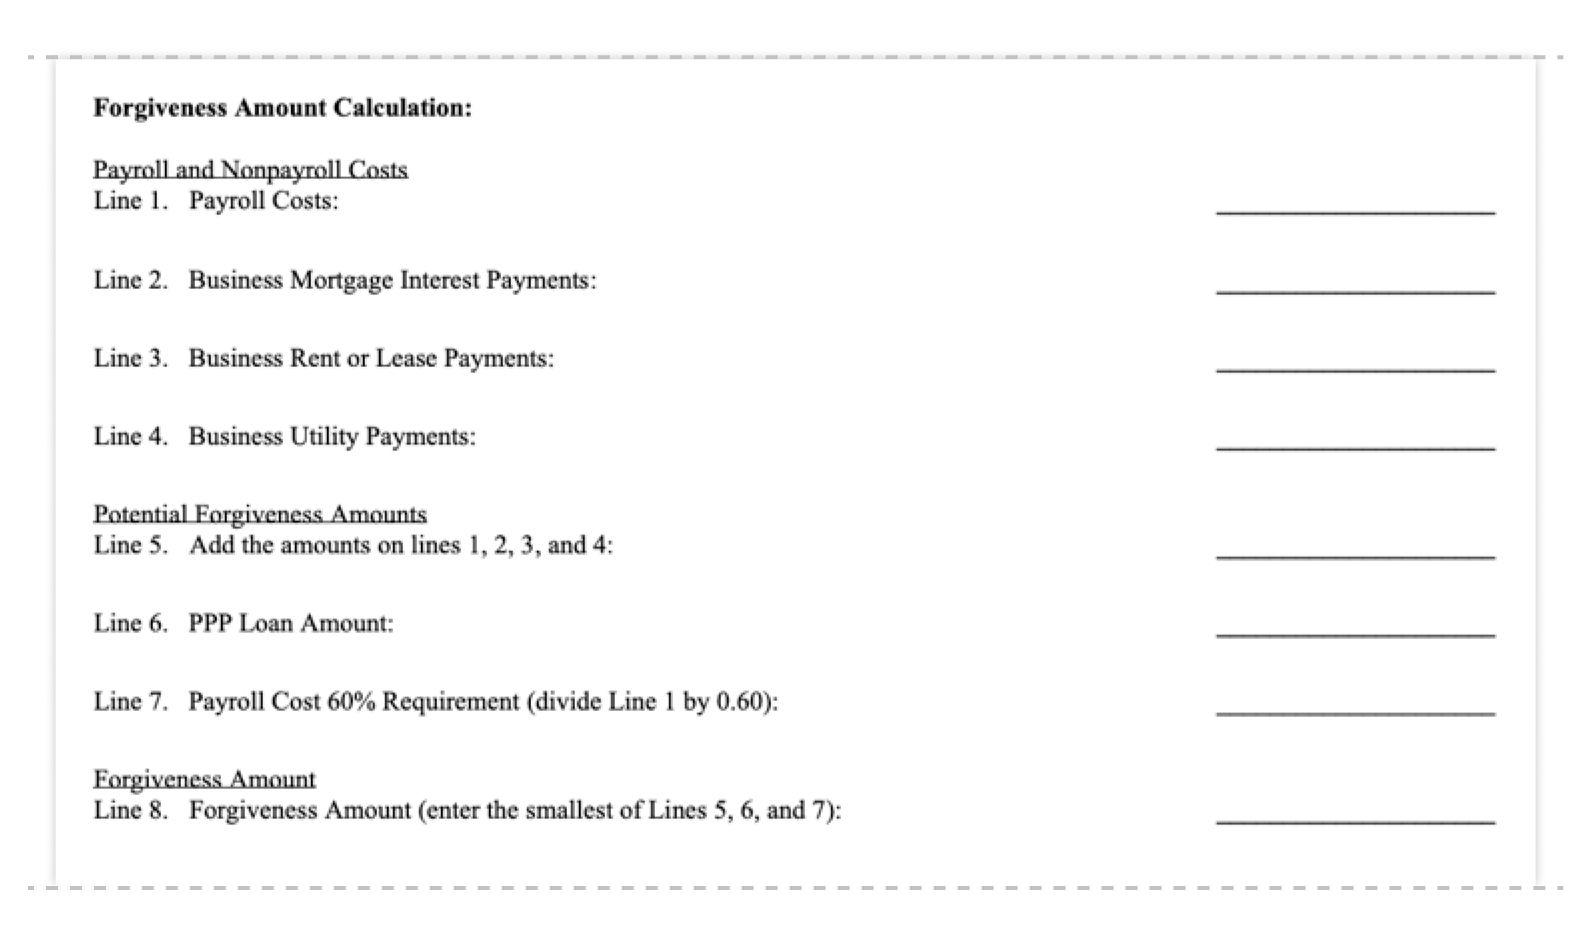 ppp loan forgiveness application form 3508EZ forgiveness amount